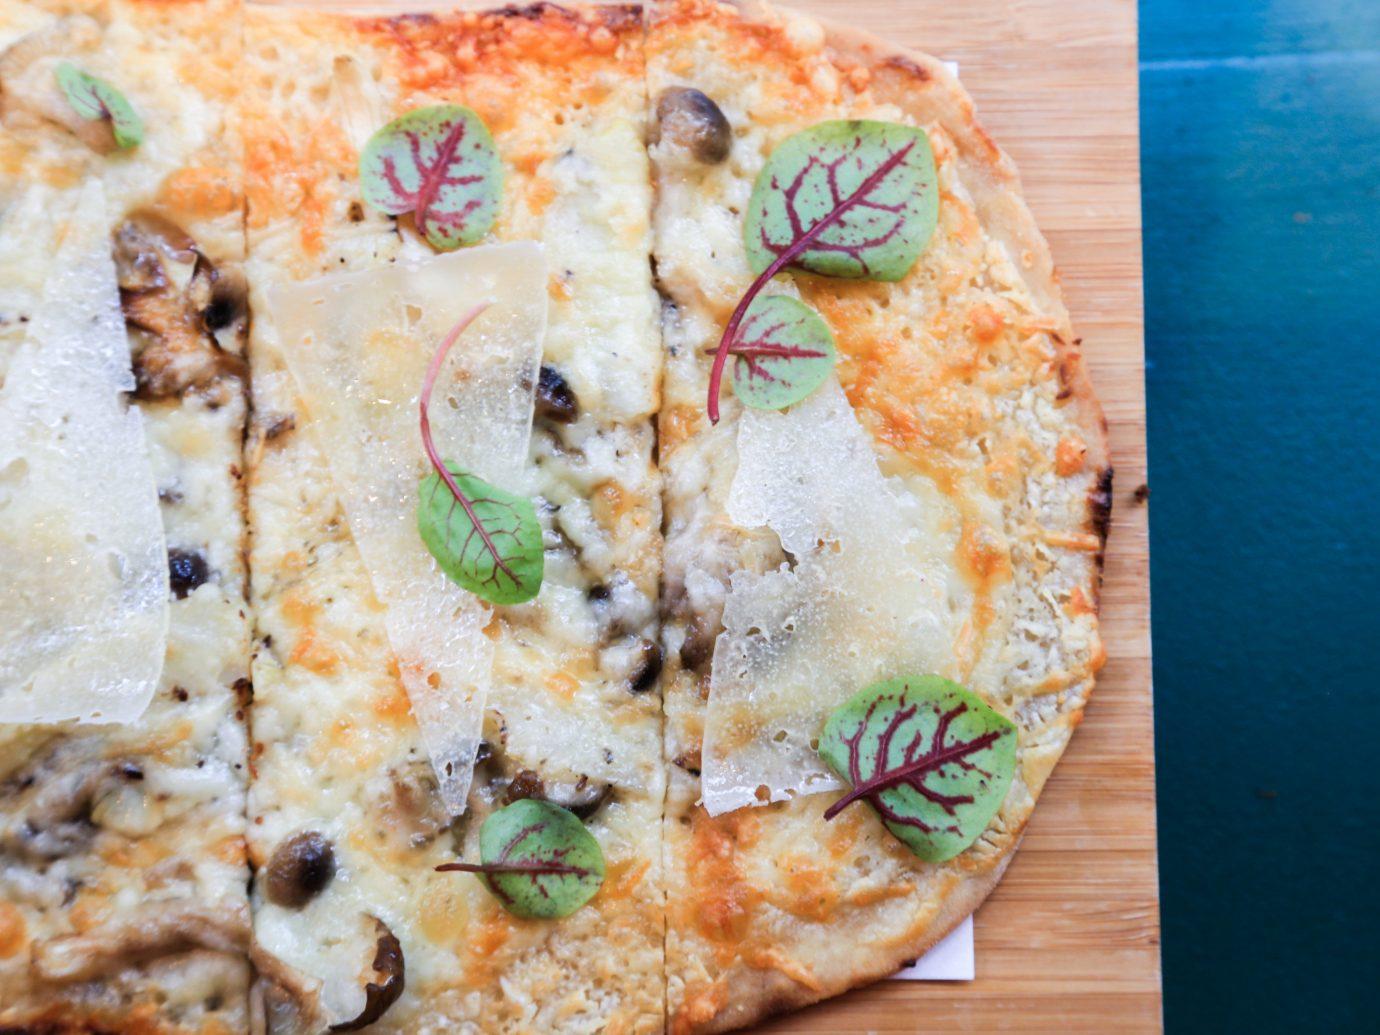 Food + Drink food dish pizza cuisine produce italian food meal breakfast baked goods fresh sliced